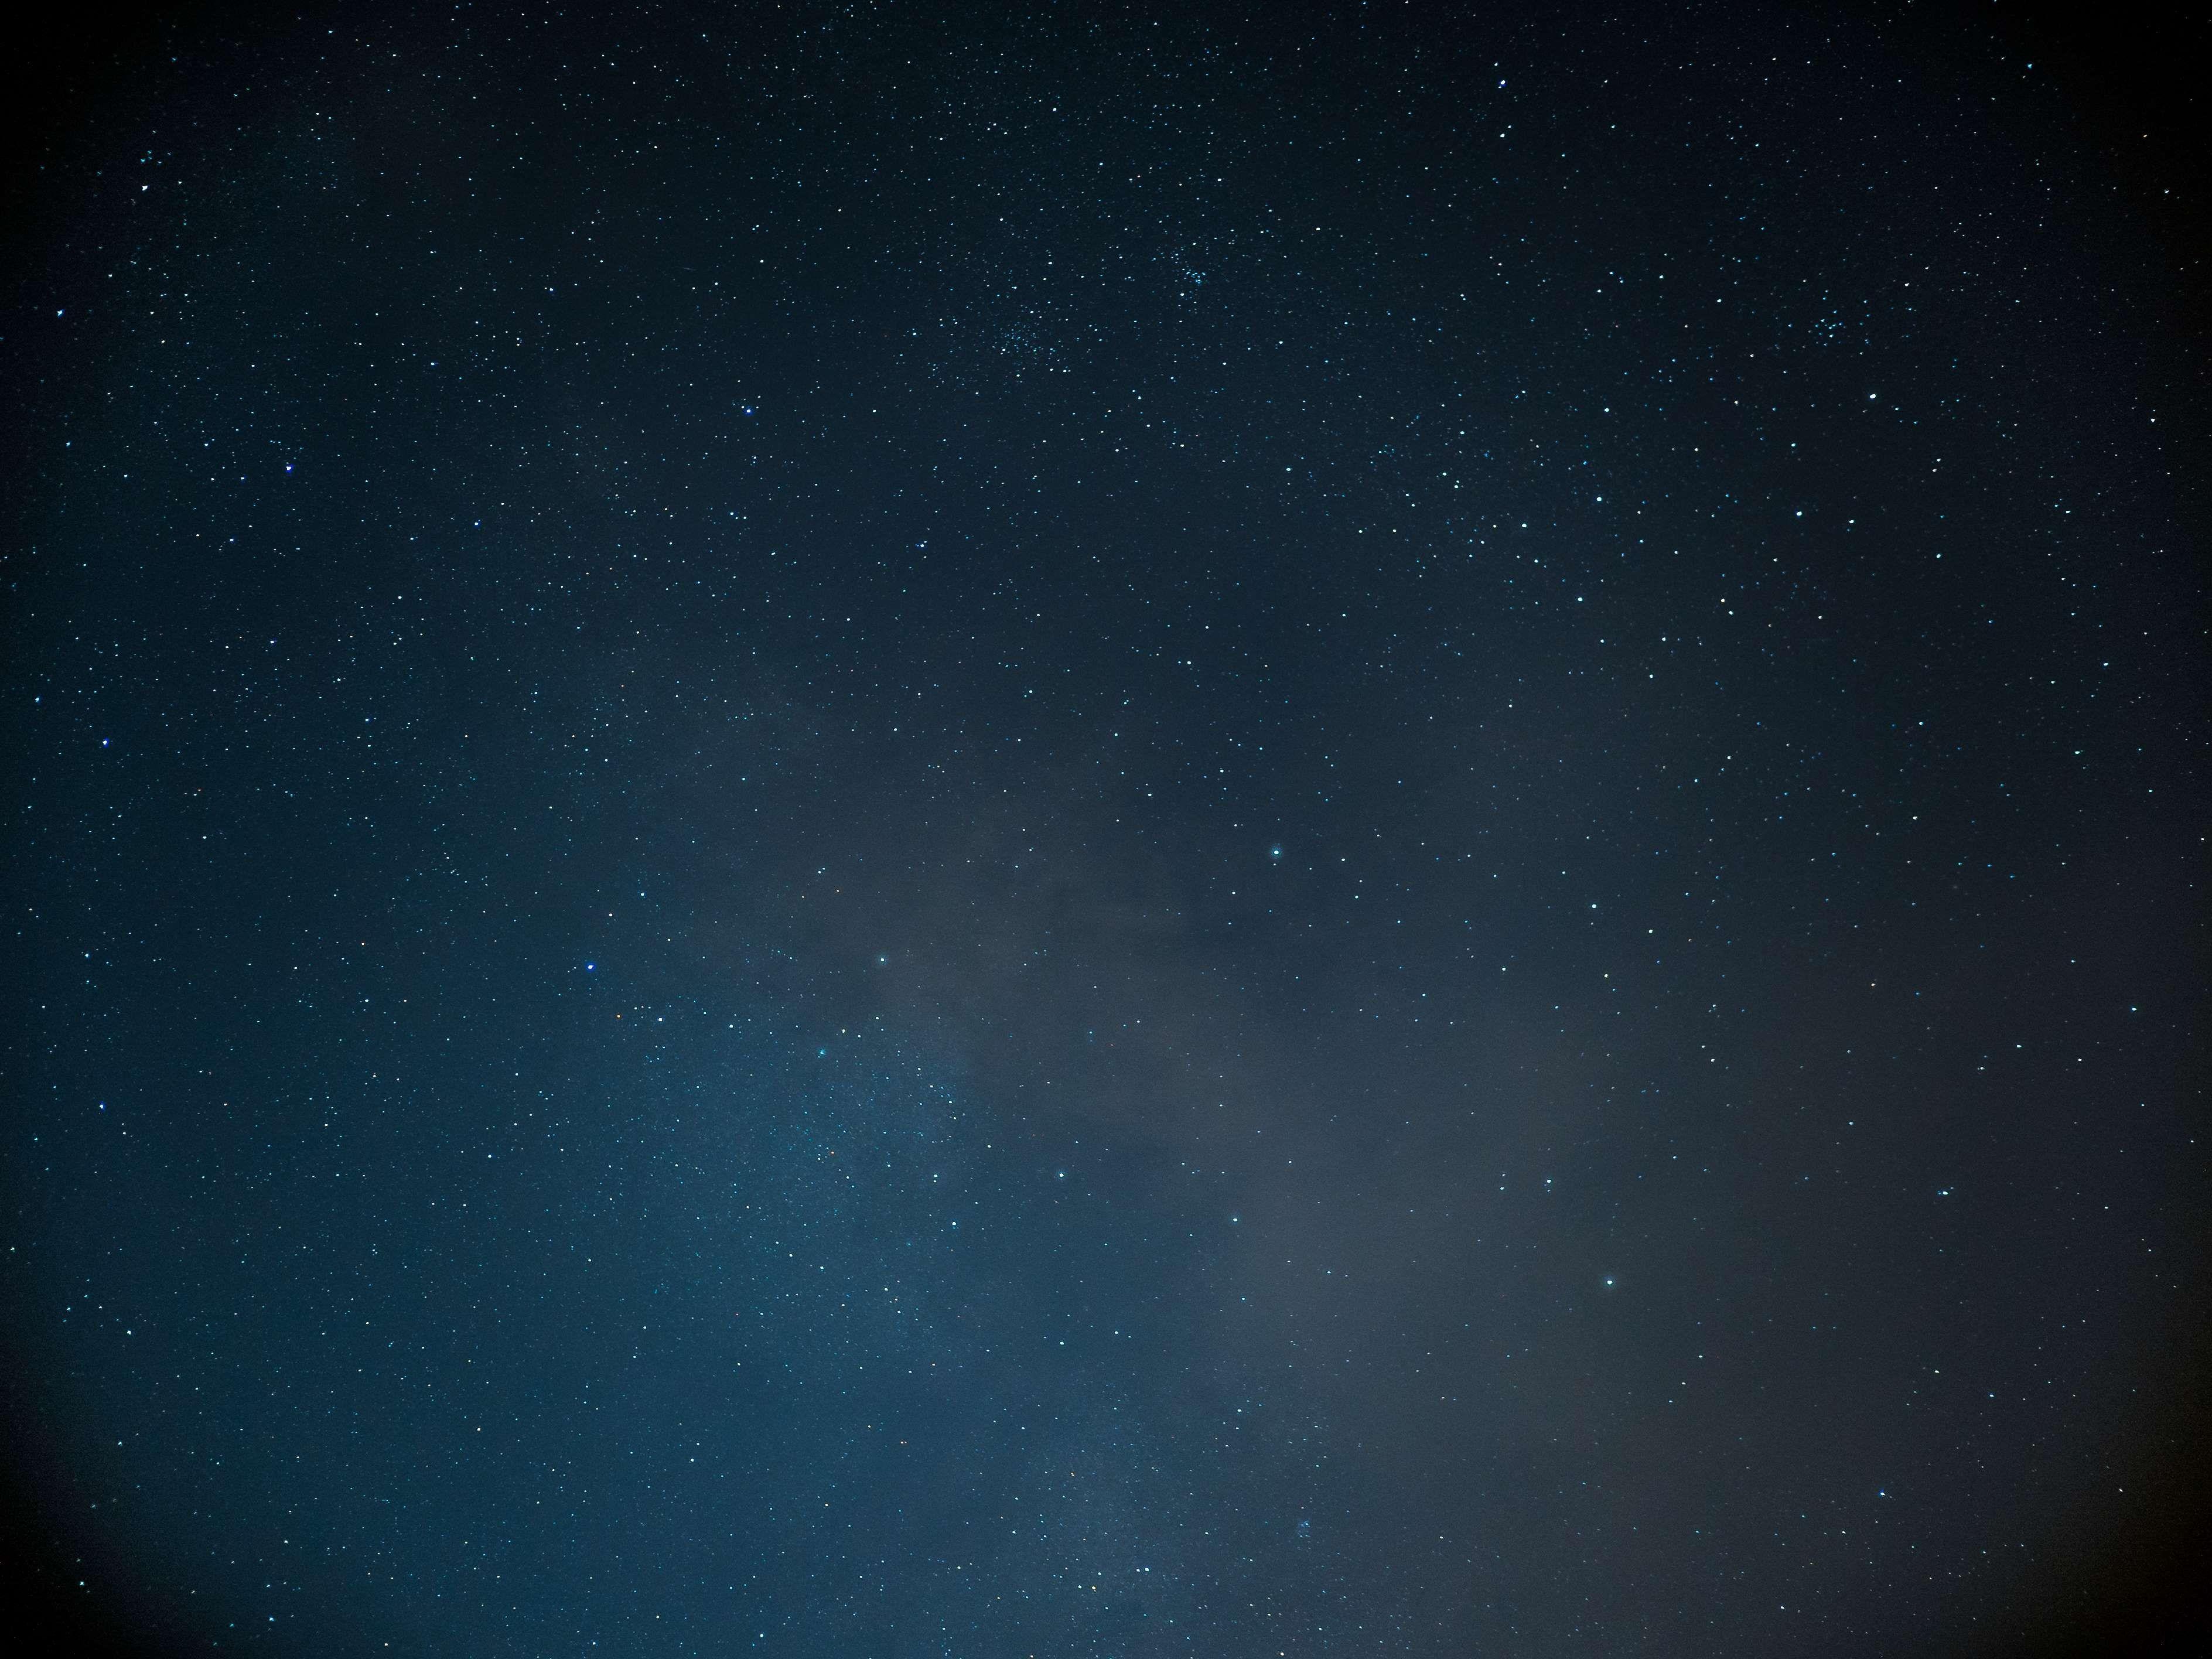 Black Blue Dark Blue Galaxies Galaxy Midnight Milky Way Night Night Sky Nightscape Nightsky Shooting Stars Sky St Night Skies Galaxies Nightscape